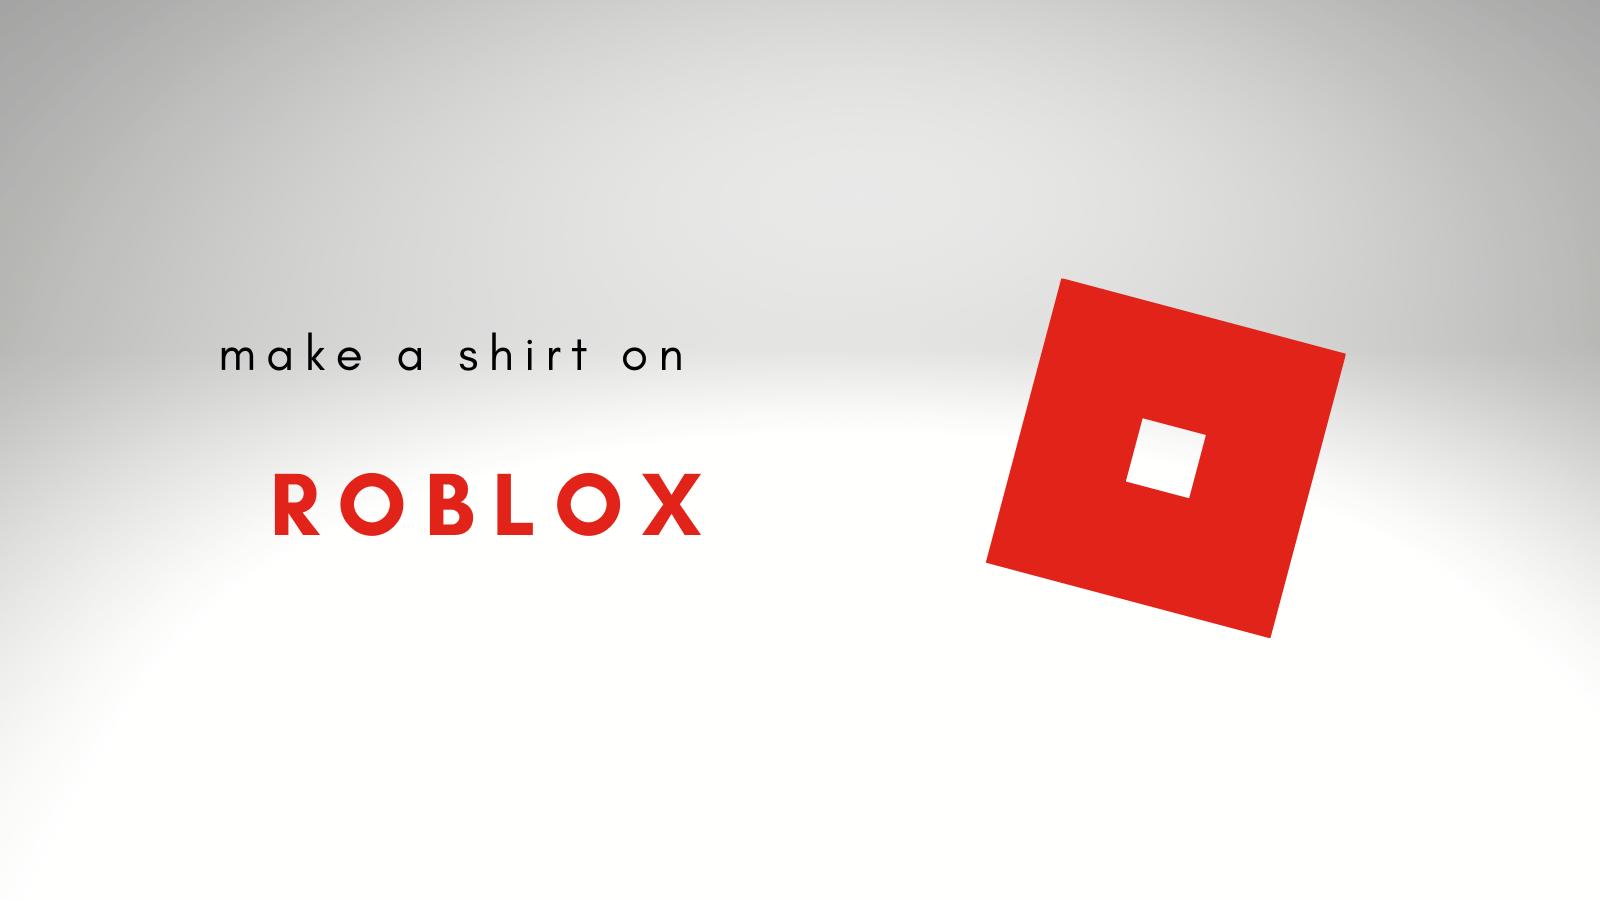 Make a Shirt on ROBLOX